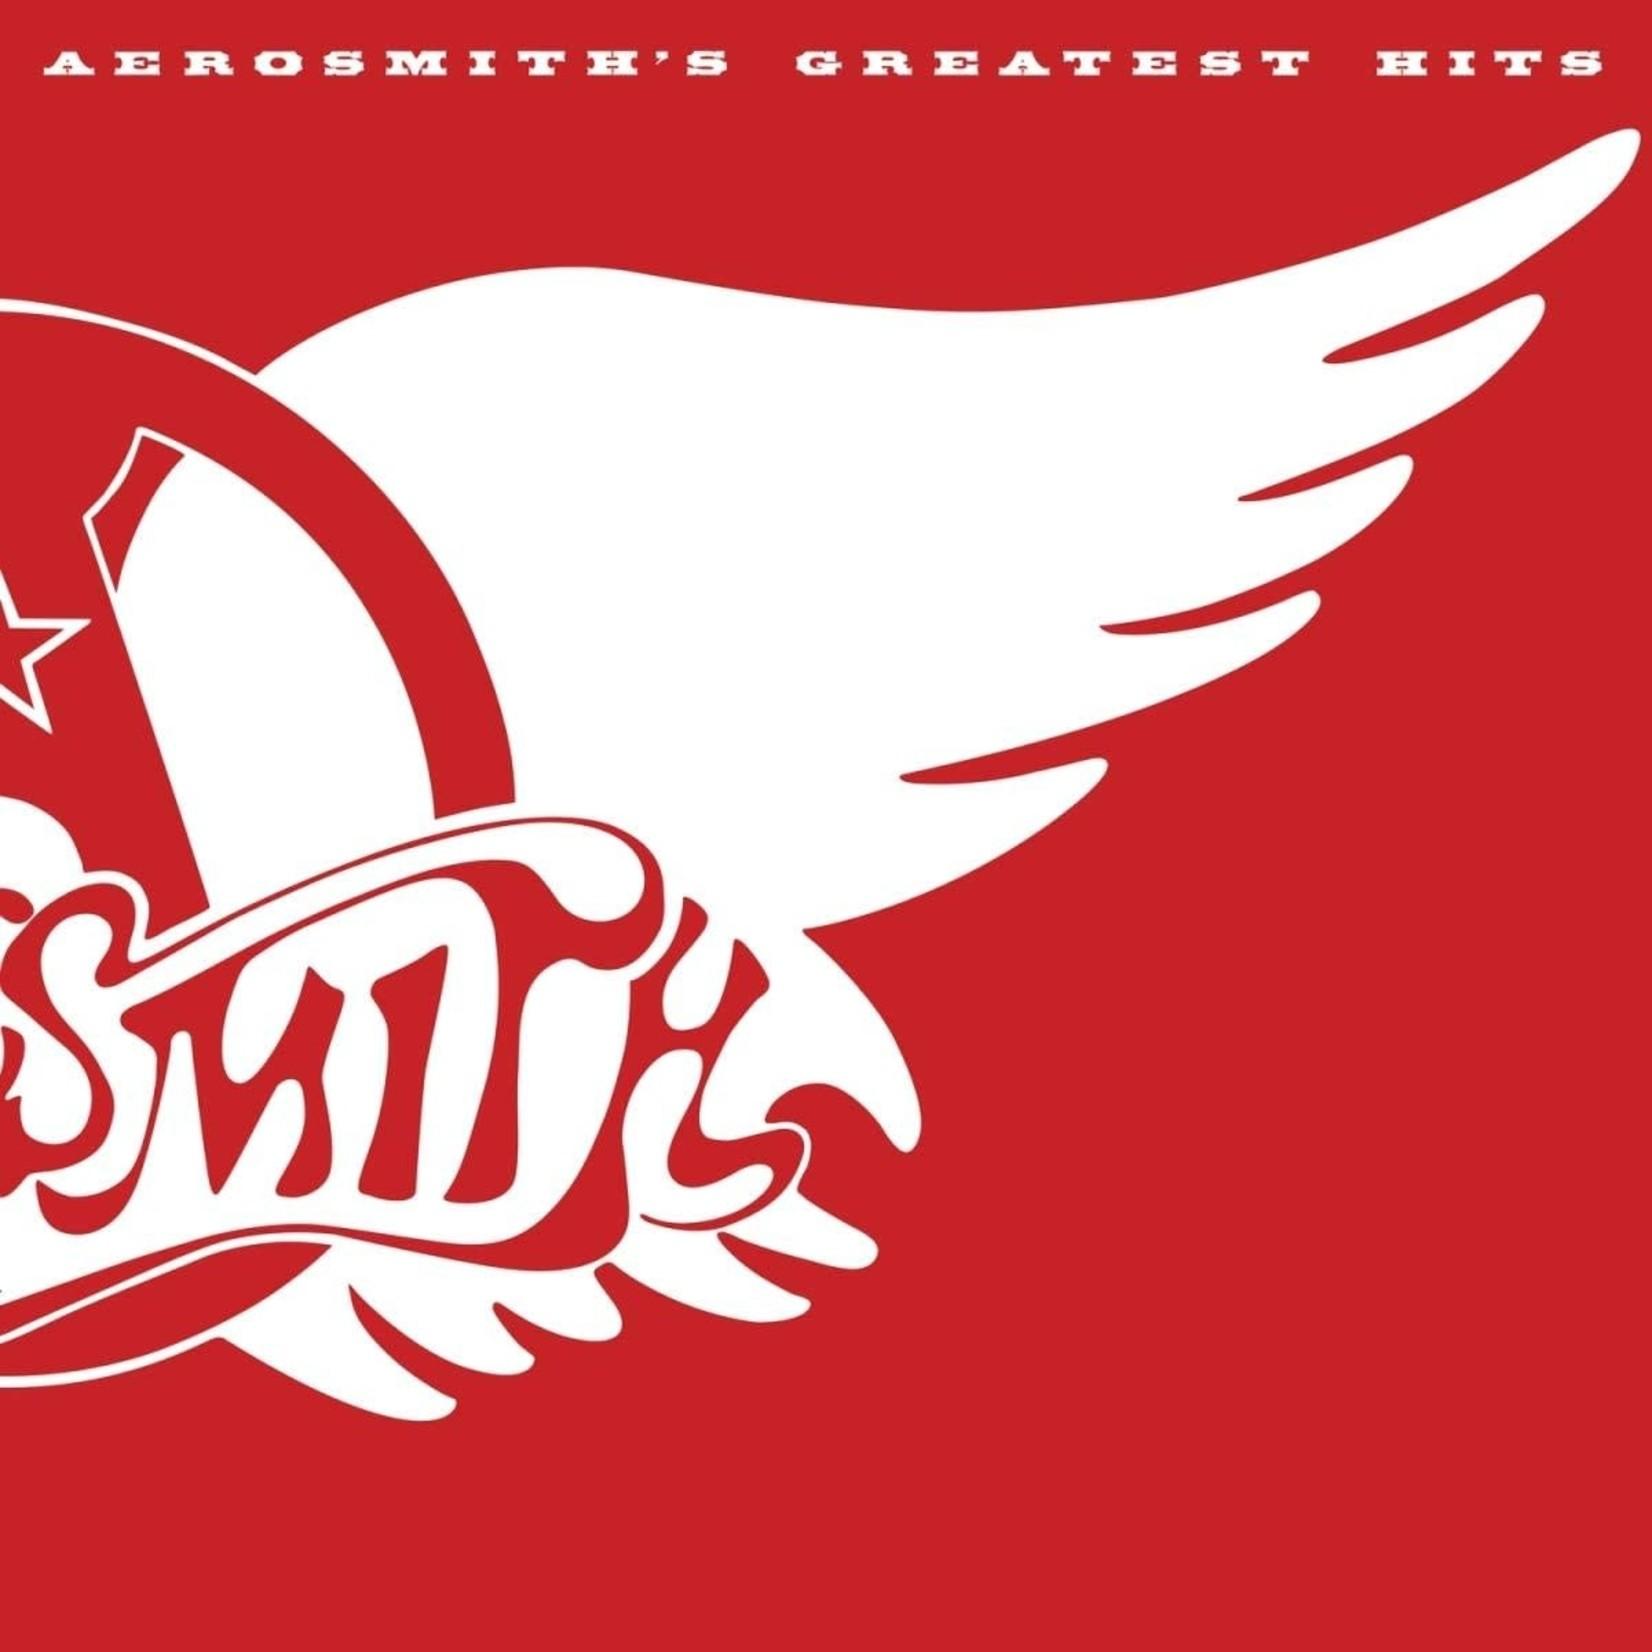 [Vintage] Aerosmith: Greatest Hits